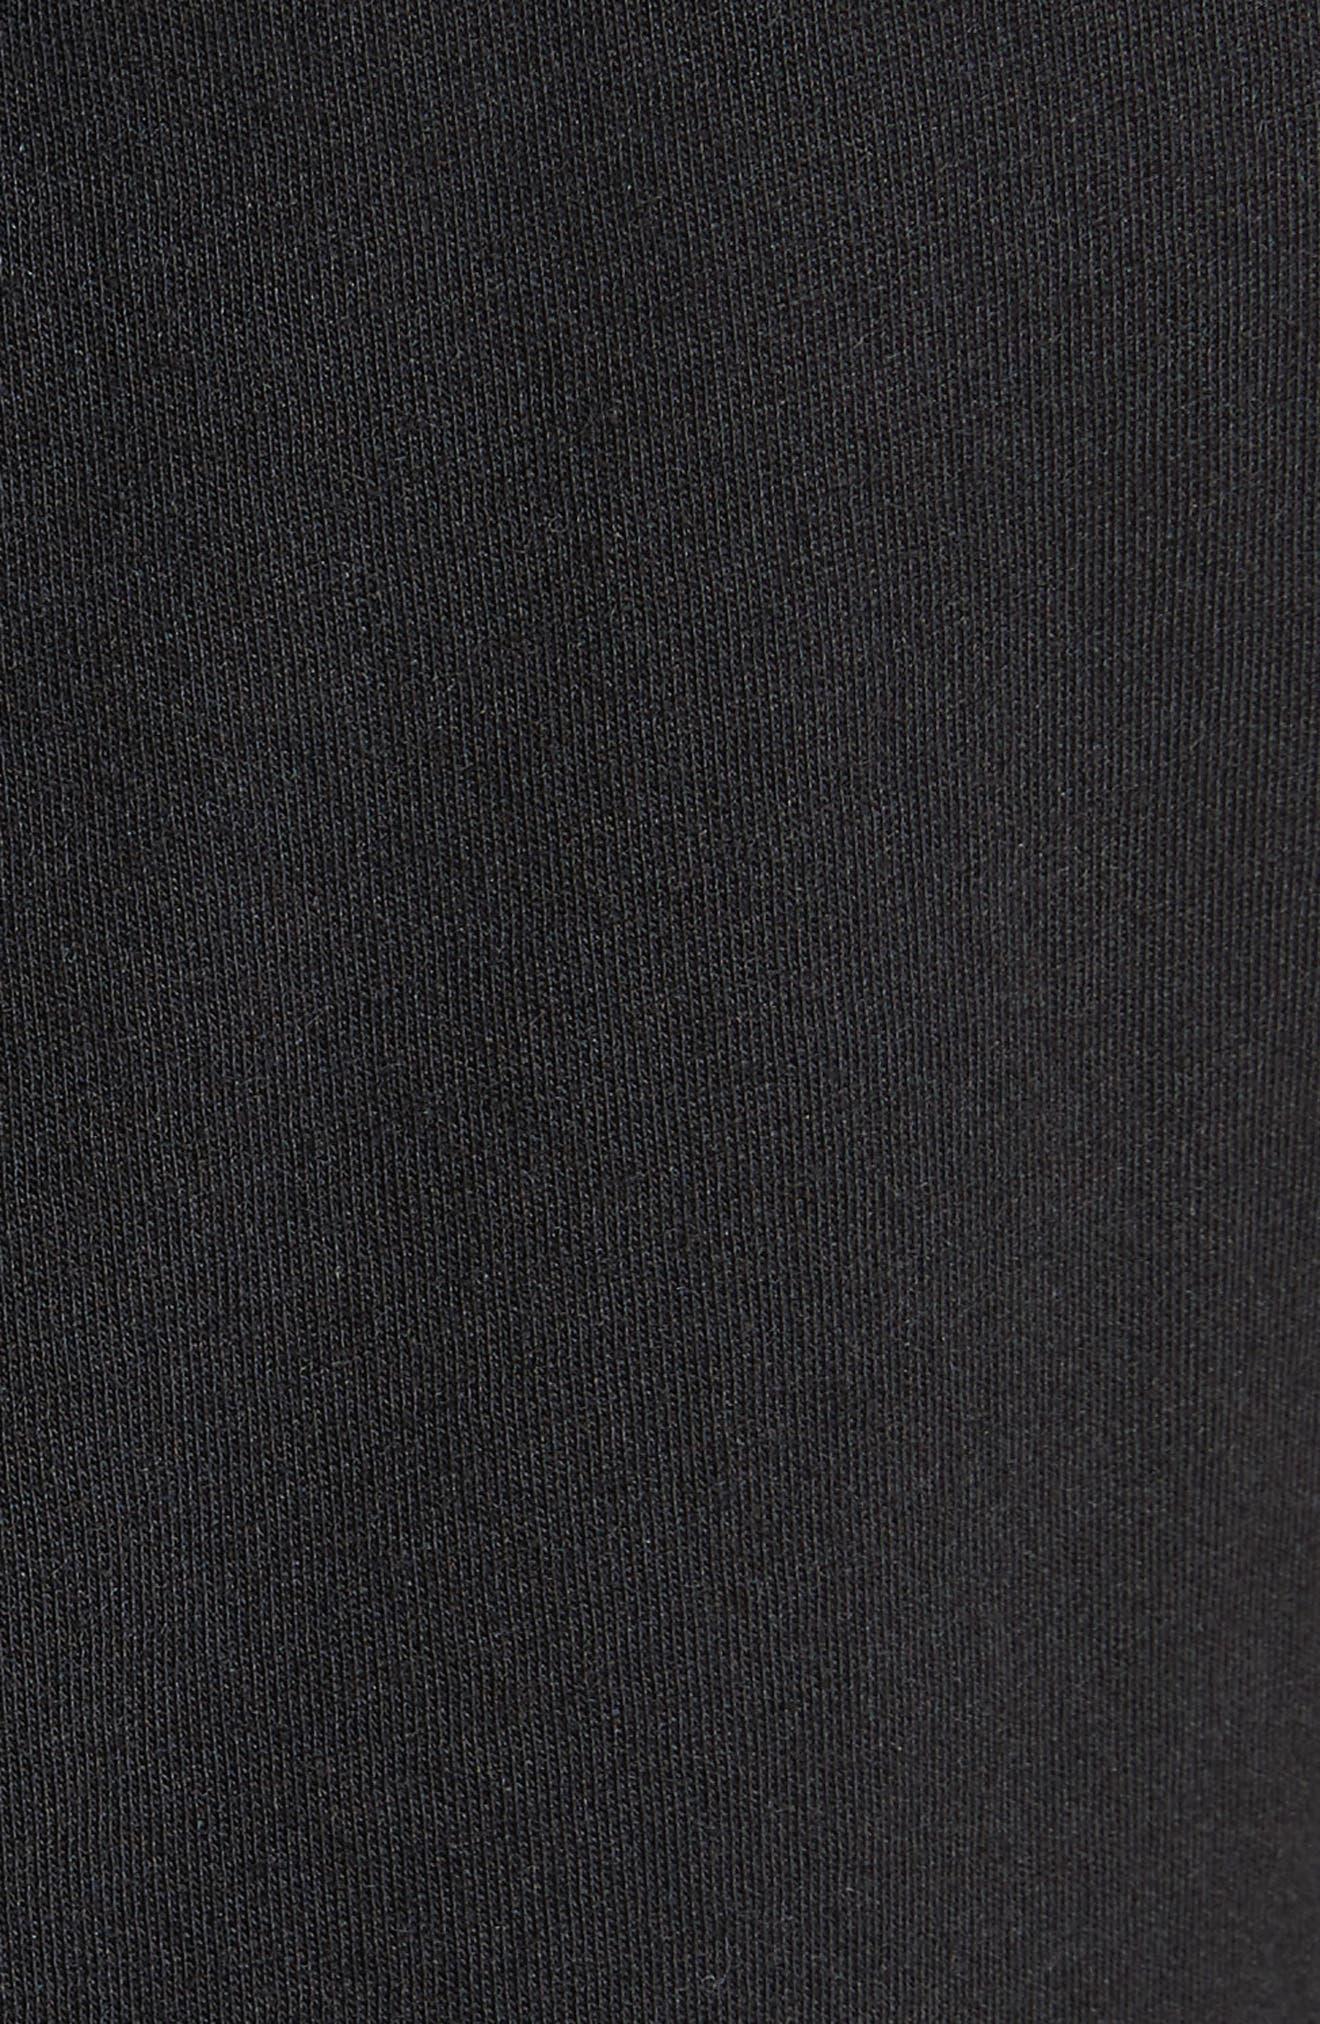 Plume Jersey Scoop Neck Swing Dress,                             Alternate thumbnail 5, color,                             001